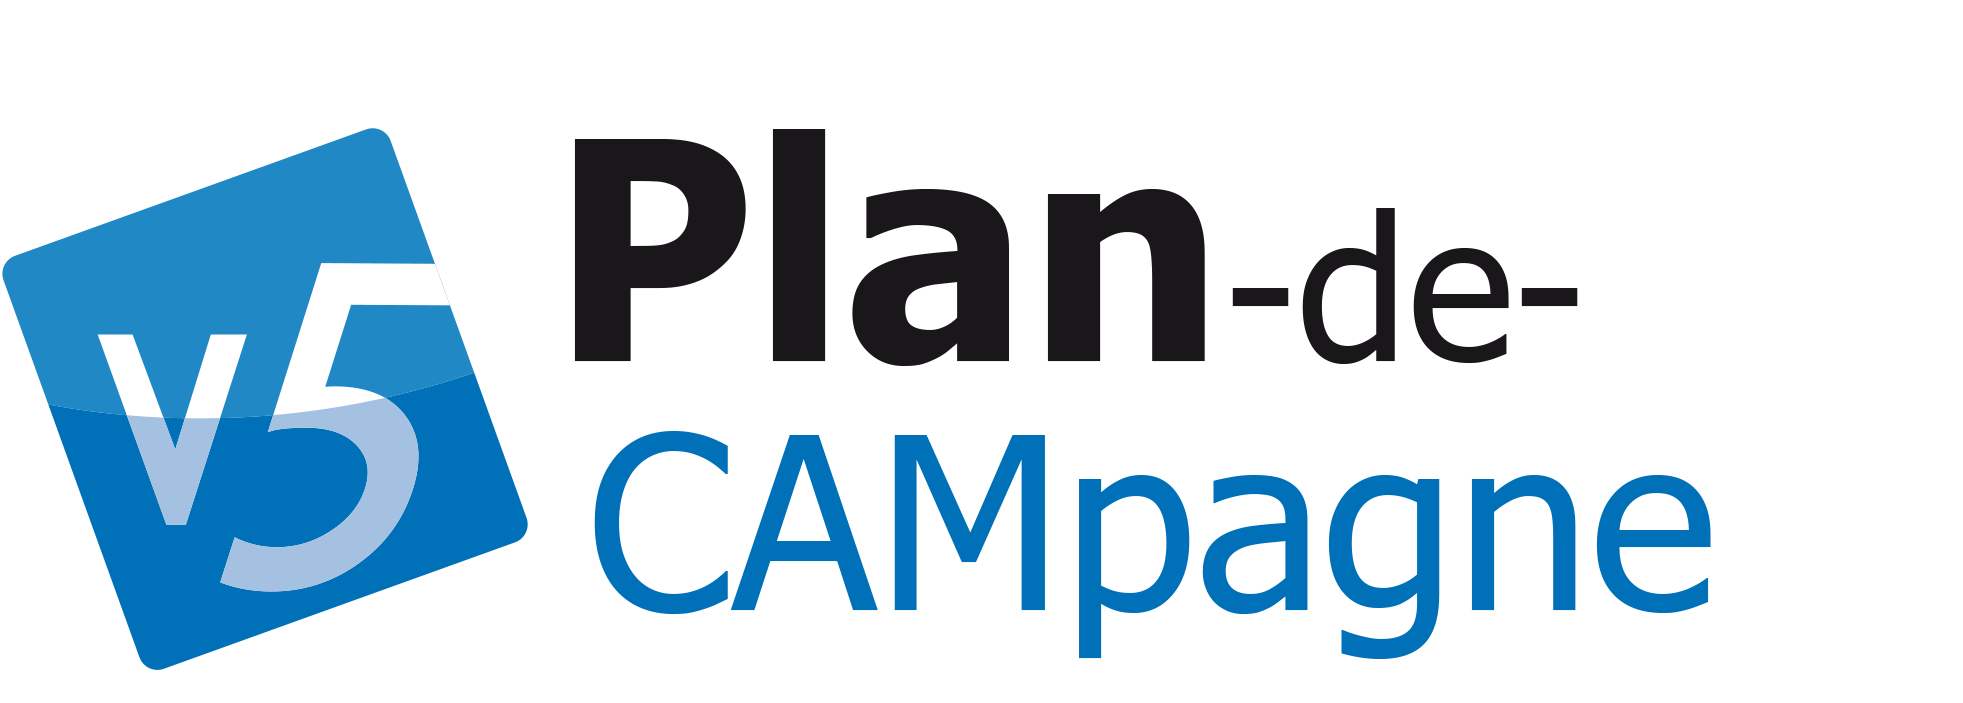 Plane-de-Campagne